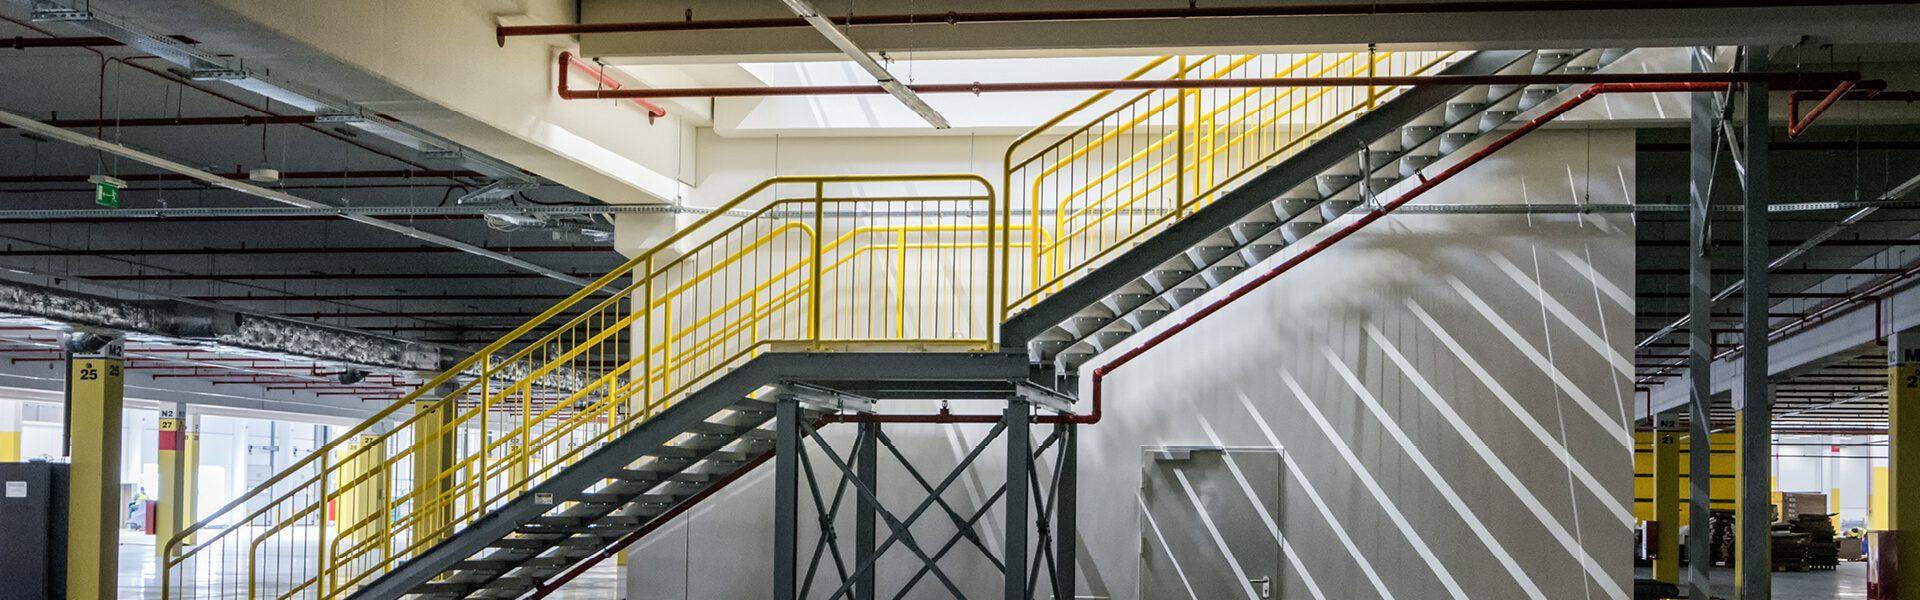 Technische Treppe